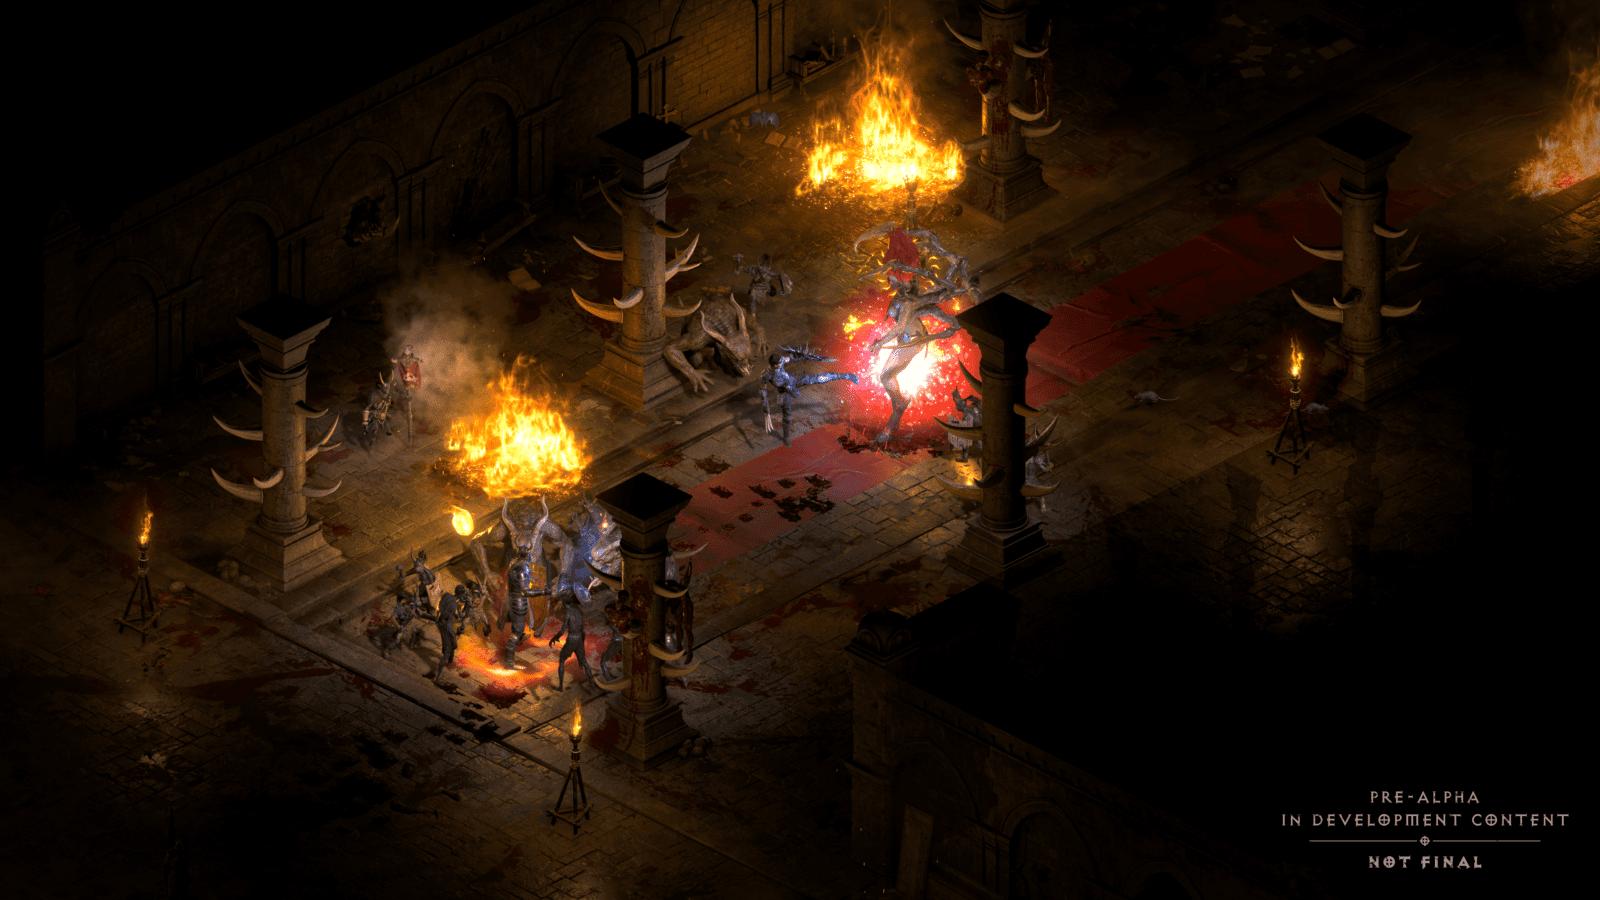 Diablo 2 Resurrected: Andariel